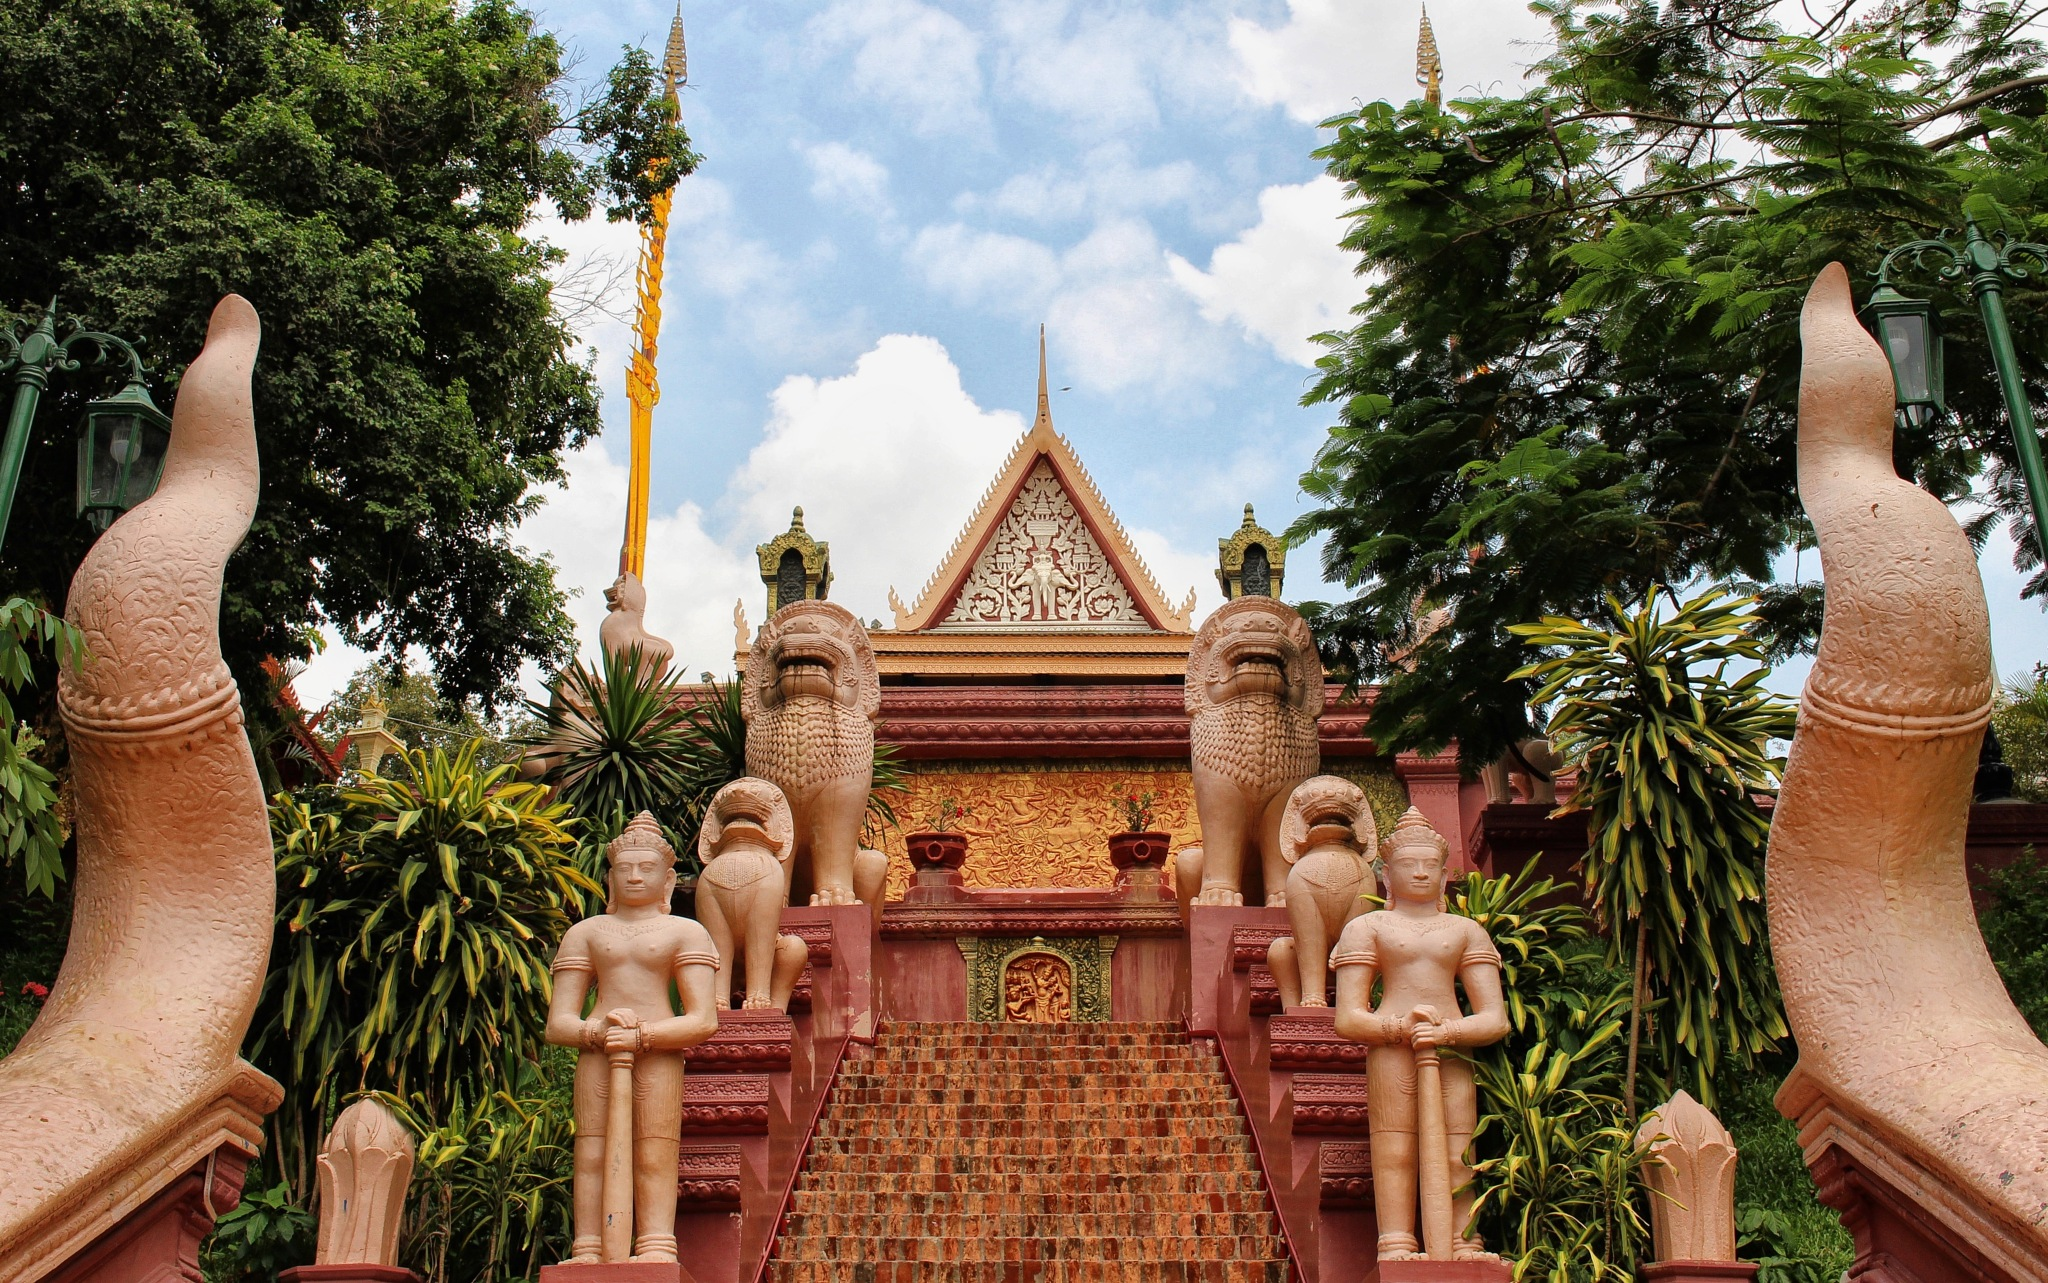 Phnom Penh by Sebastiano Stefanetto